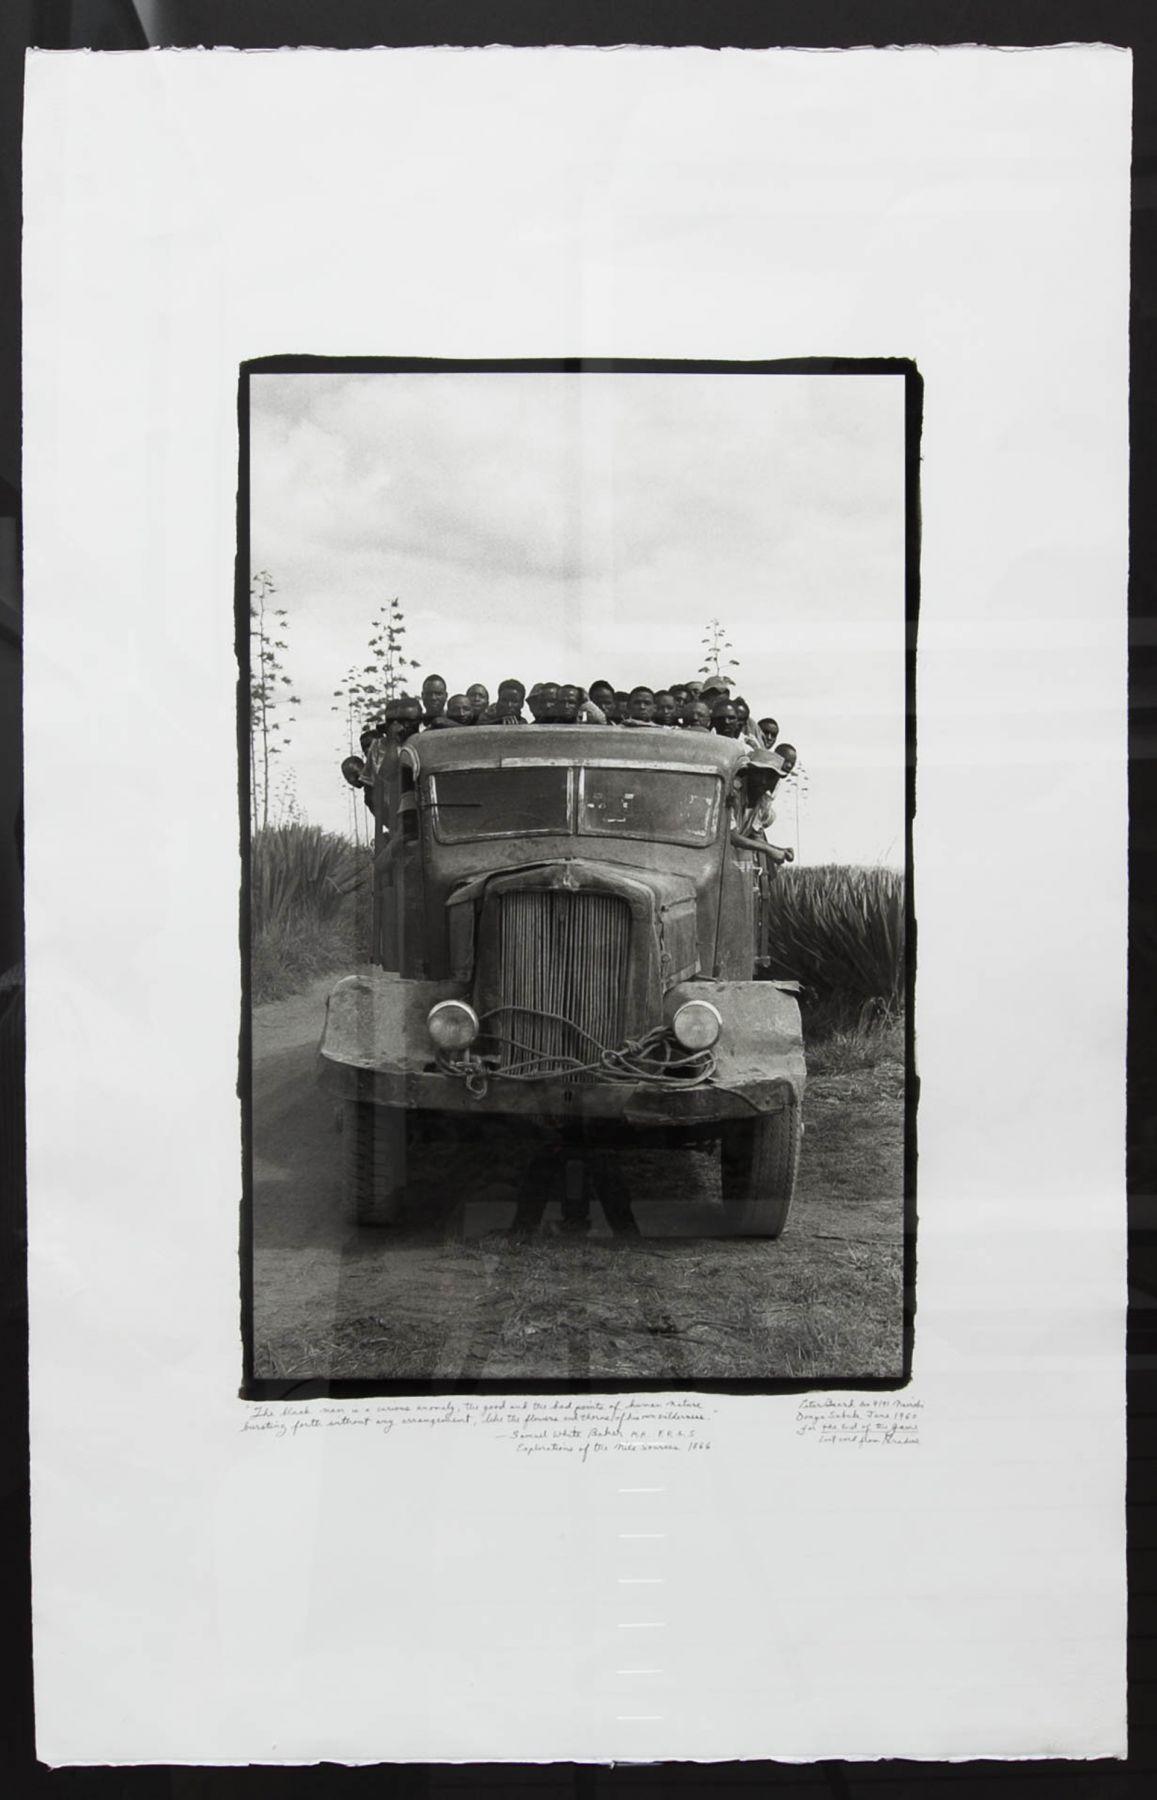 Viva La Differance, Danya Subuk, 1968/1998, 40 x 26 Inches, Platinum Palladium Photograph